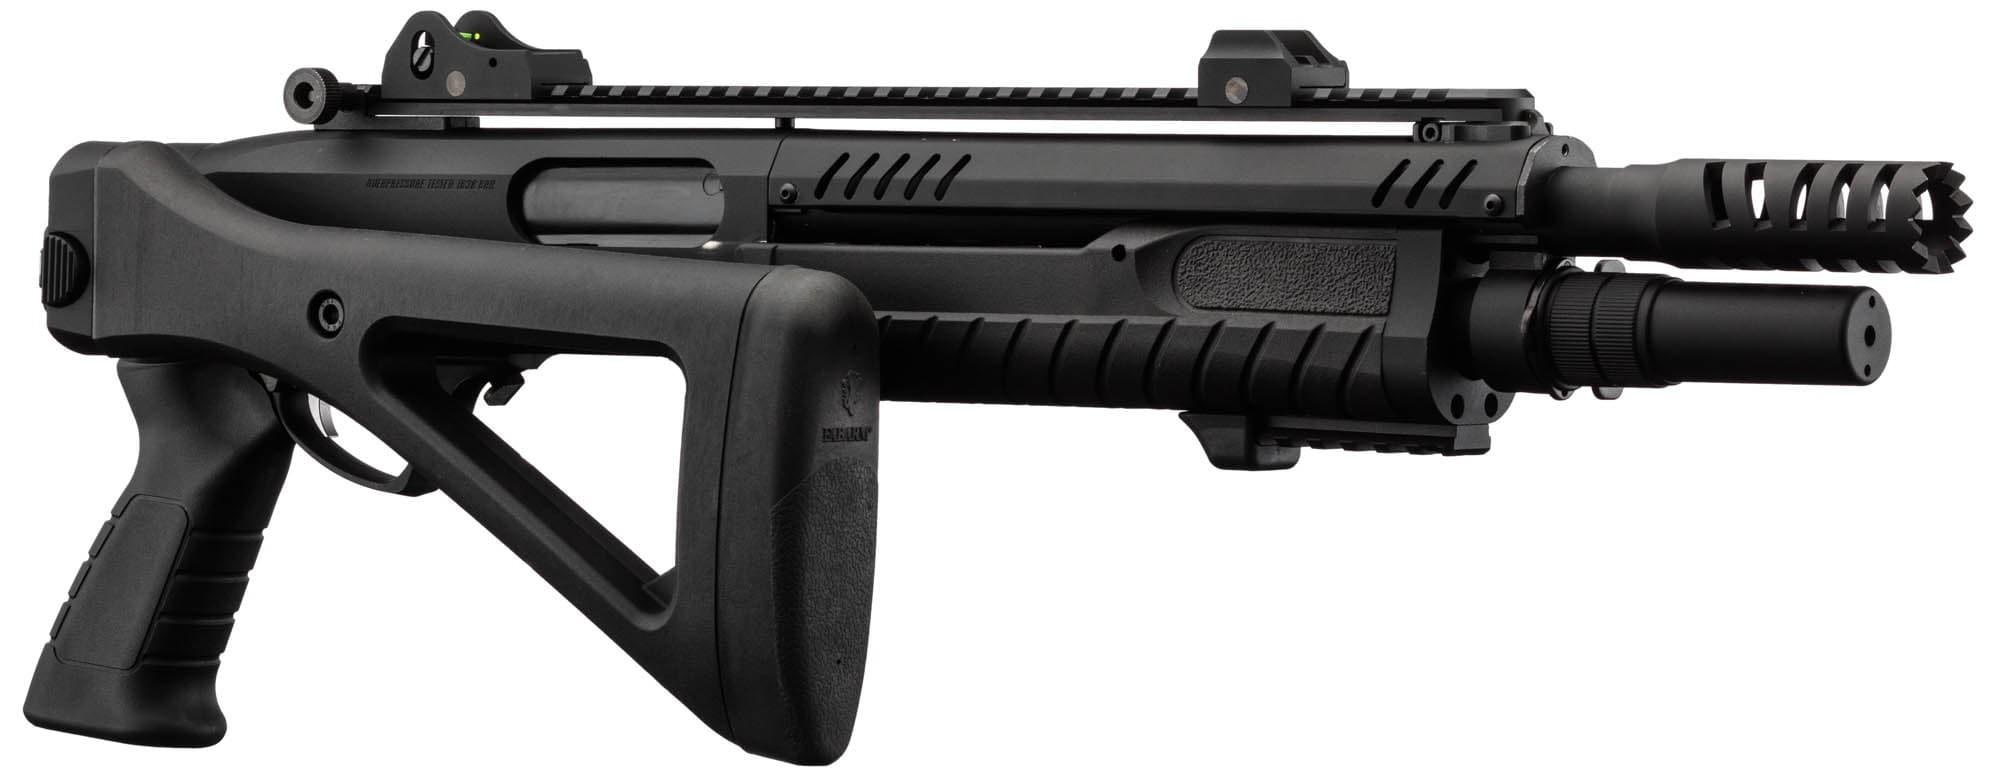 FABARM Shotgun STF 12 11 COMPACT GAS 3 OR 6 SHOTS BLACK 1J